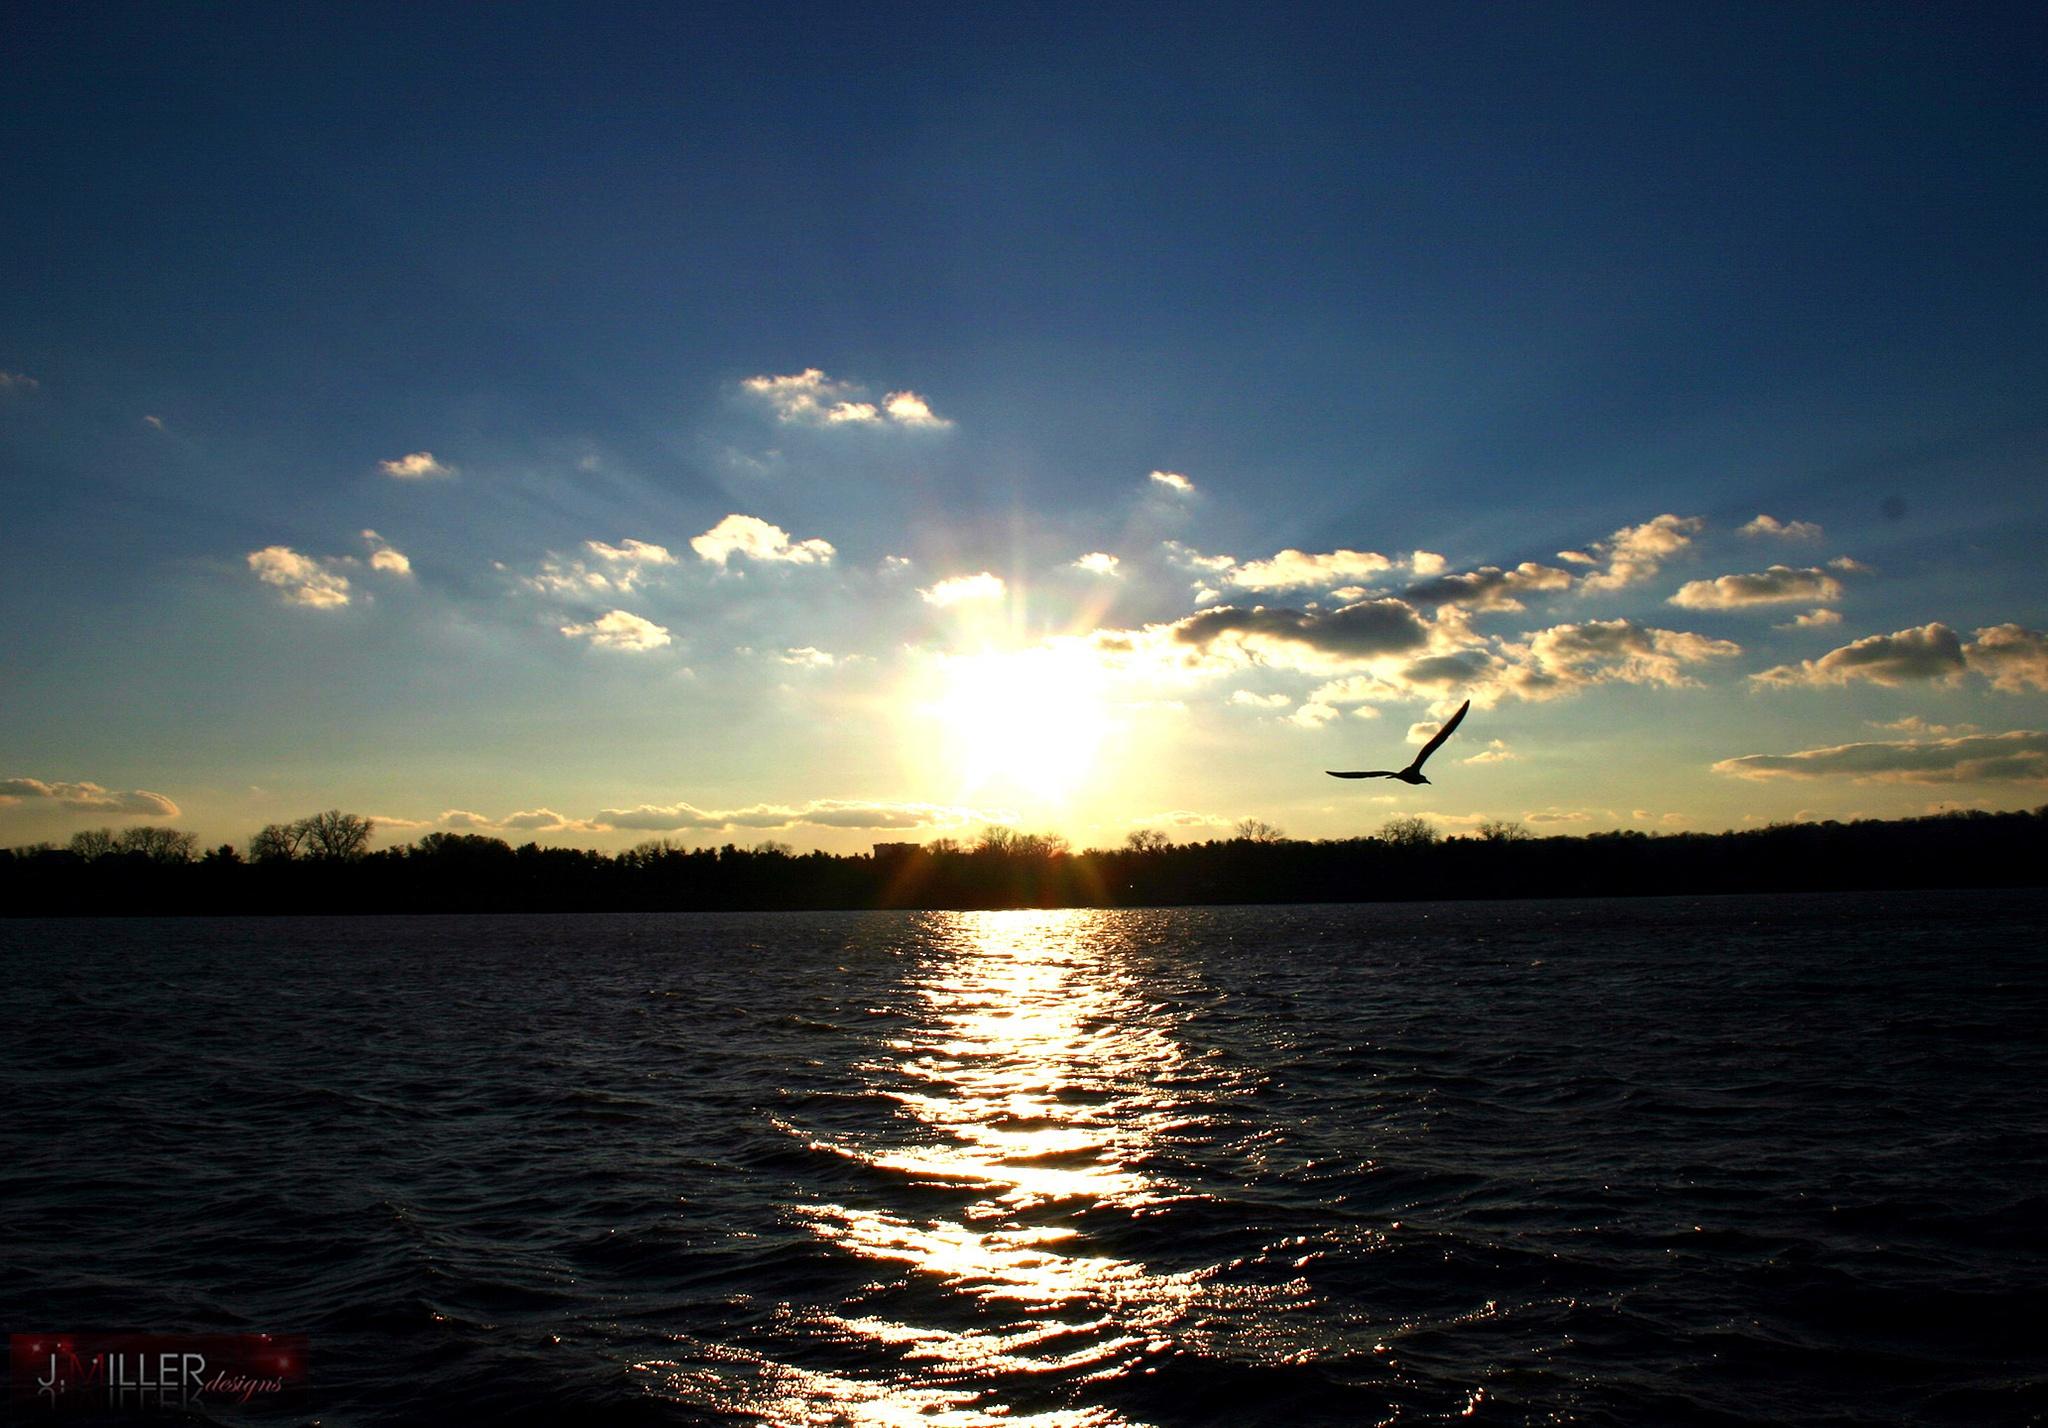 Potomac River Sunset by Justin Miller